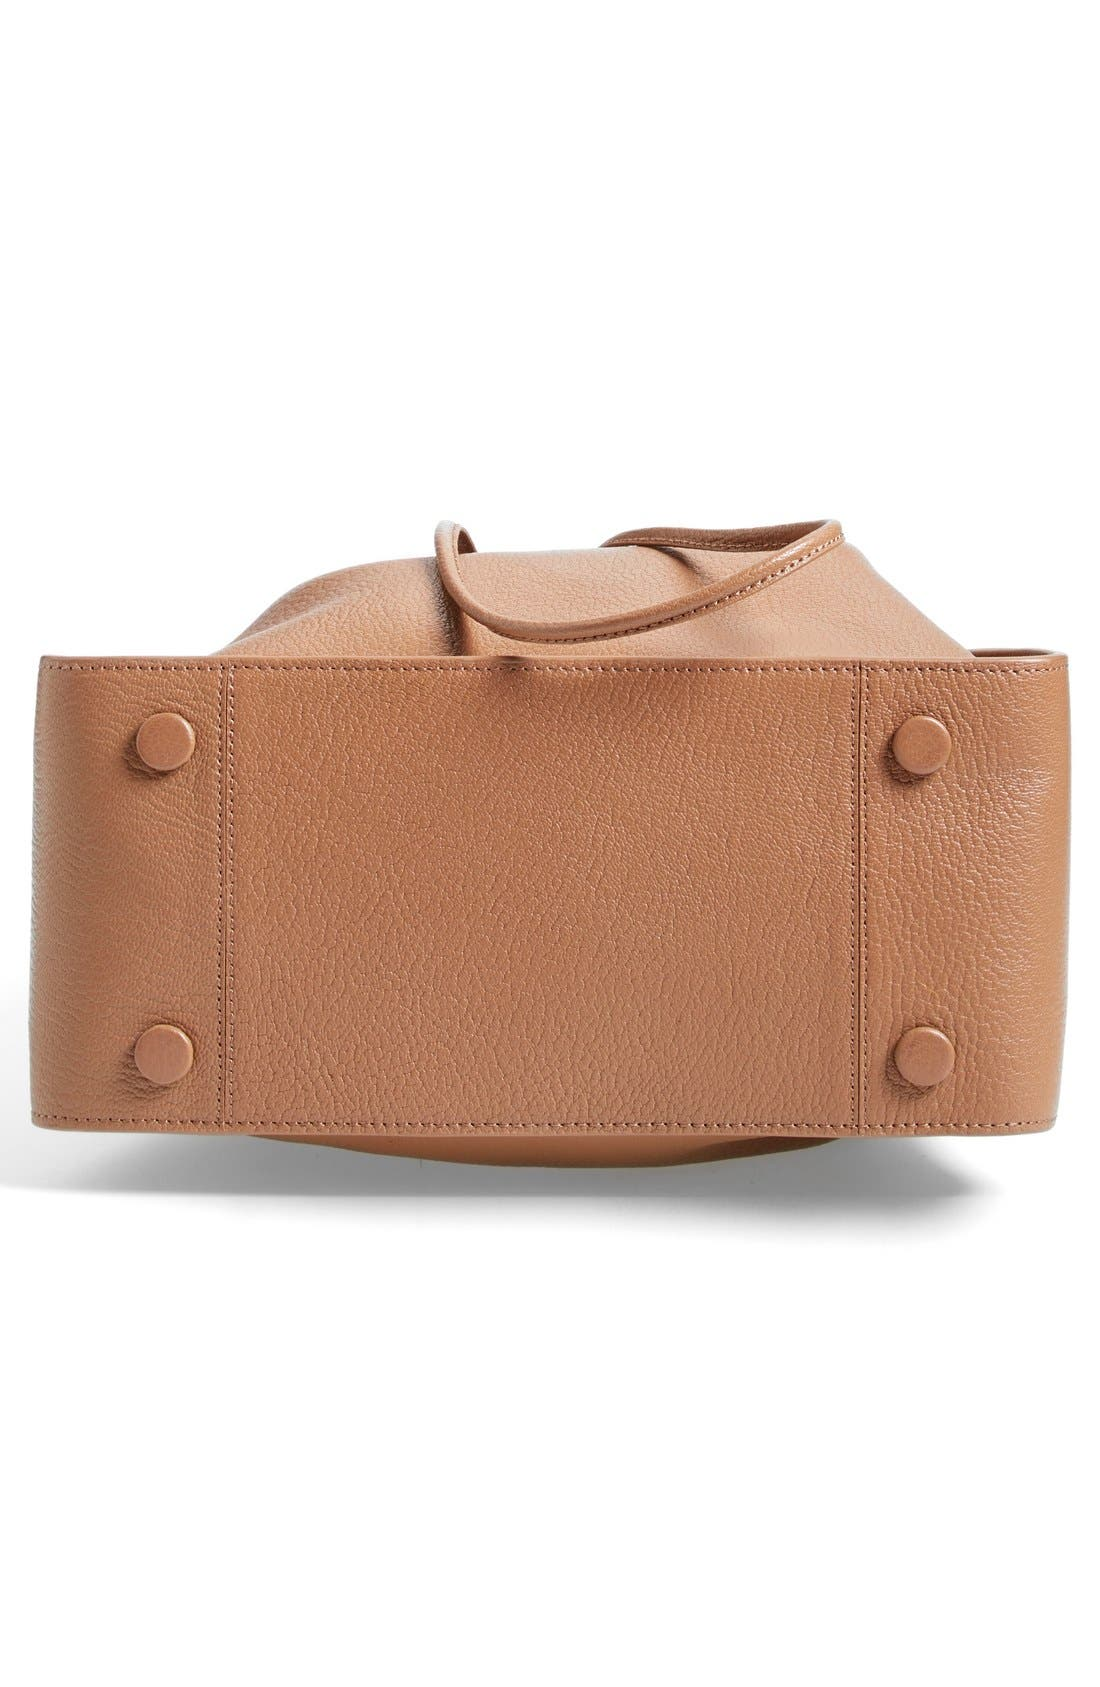 'Large Soleil' Leather Bucket Bag,                             Alternate thumbnail 11, color,